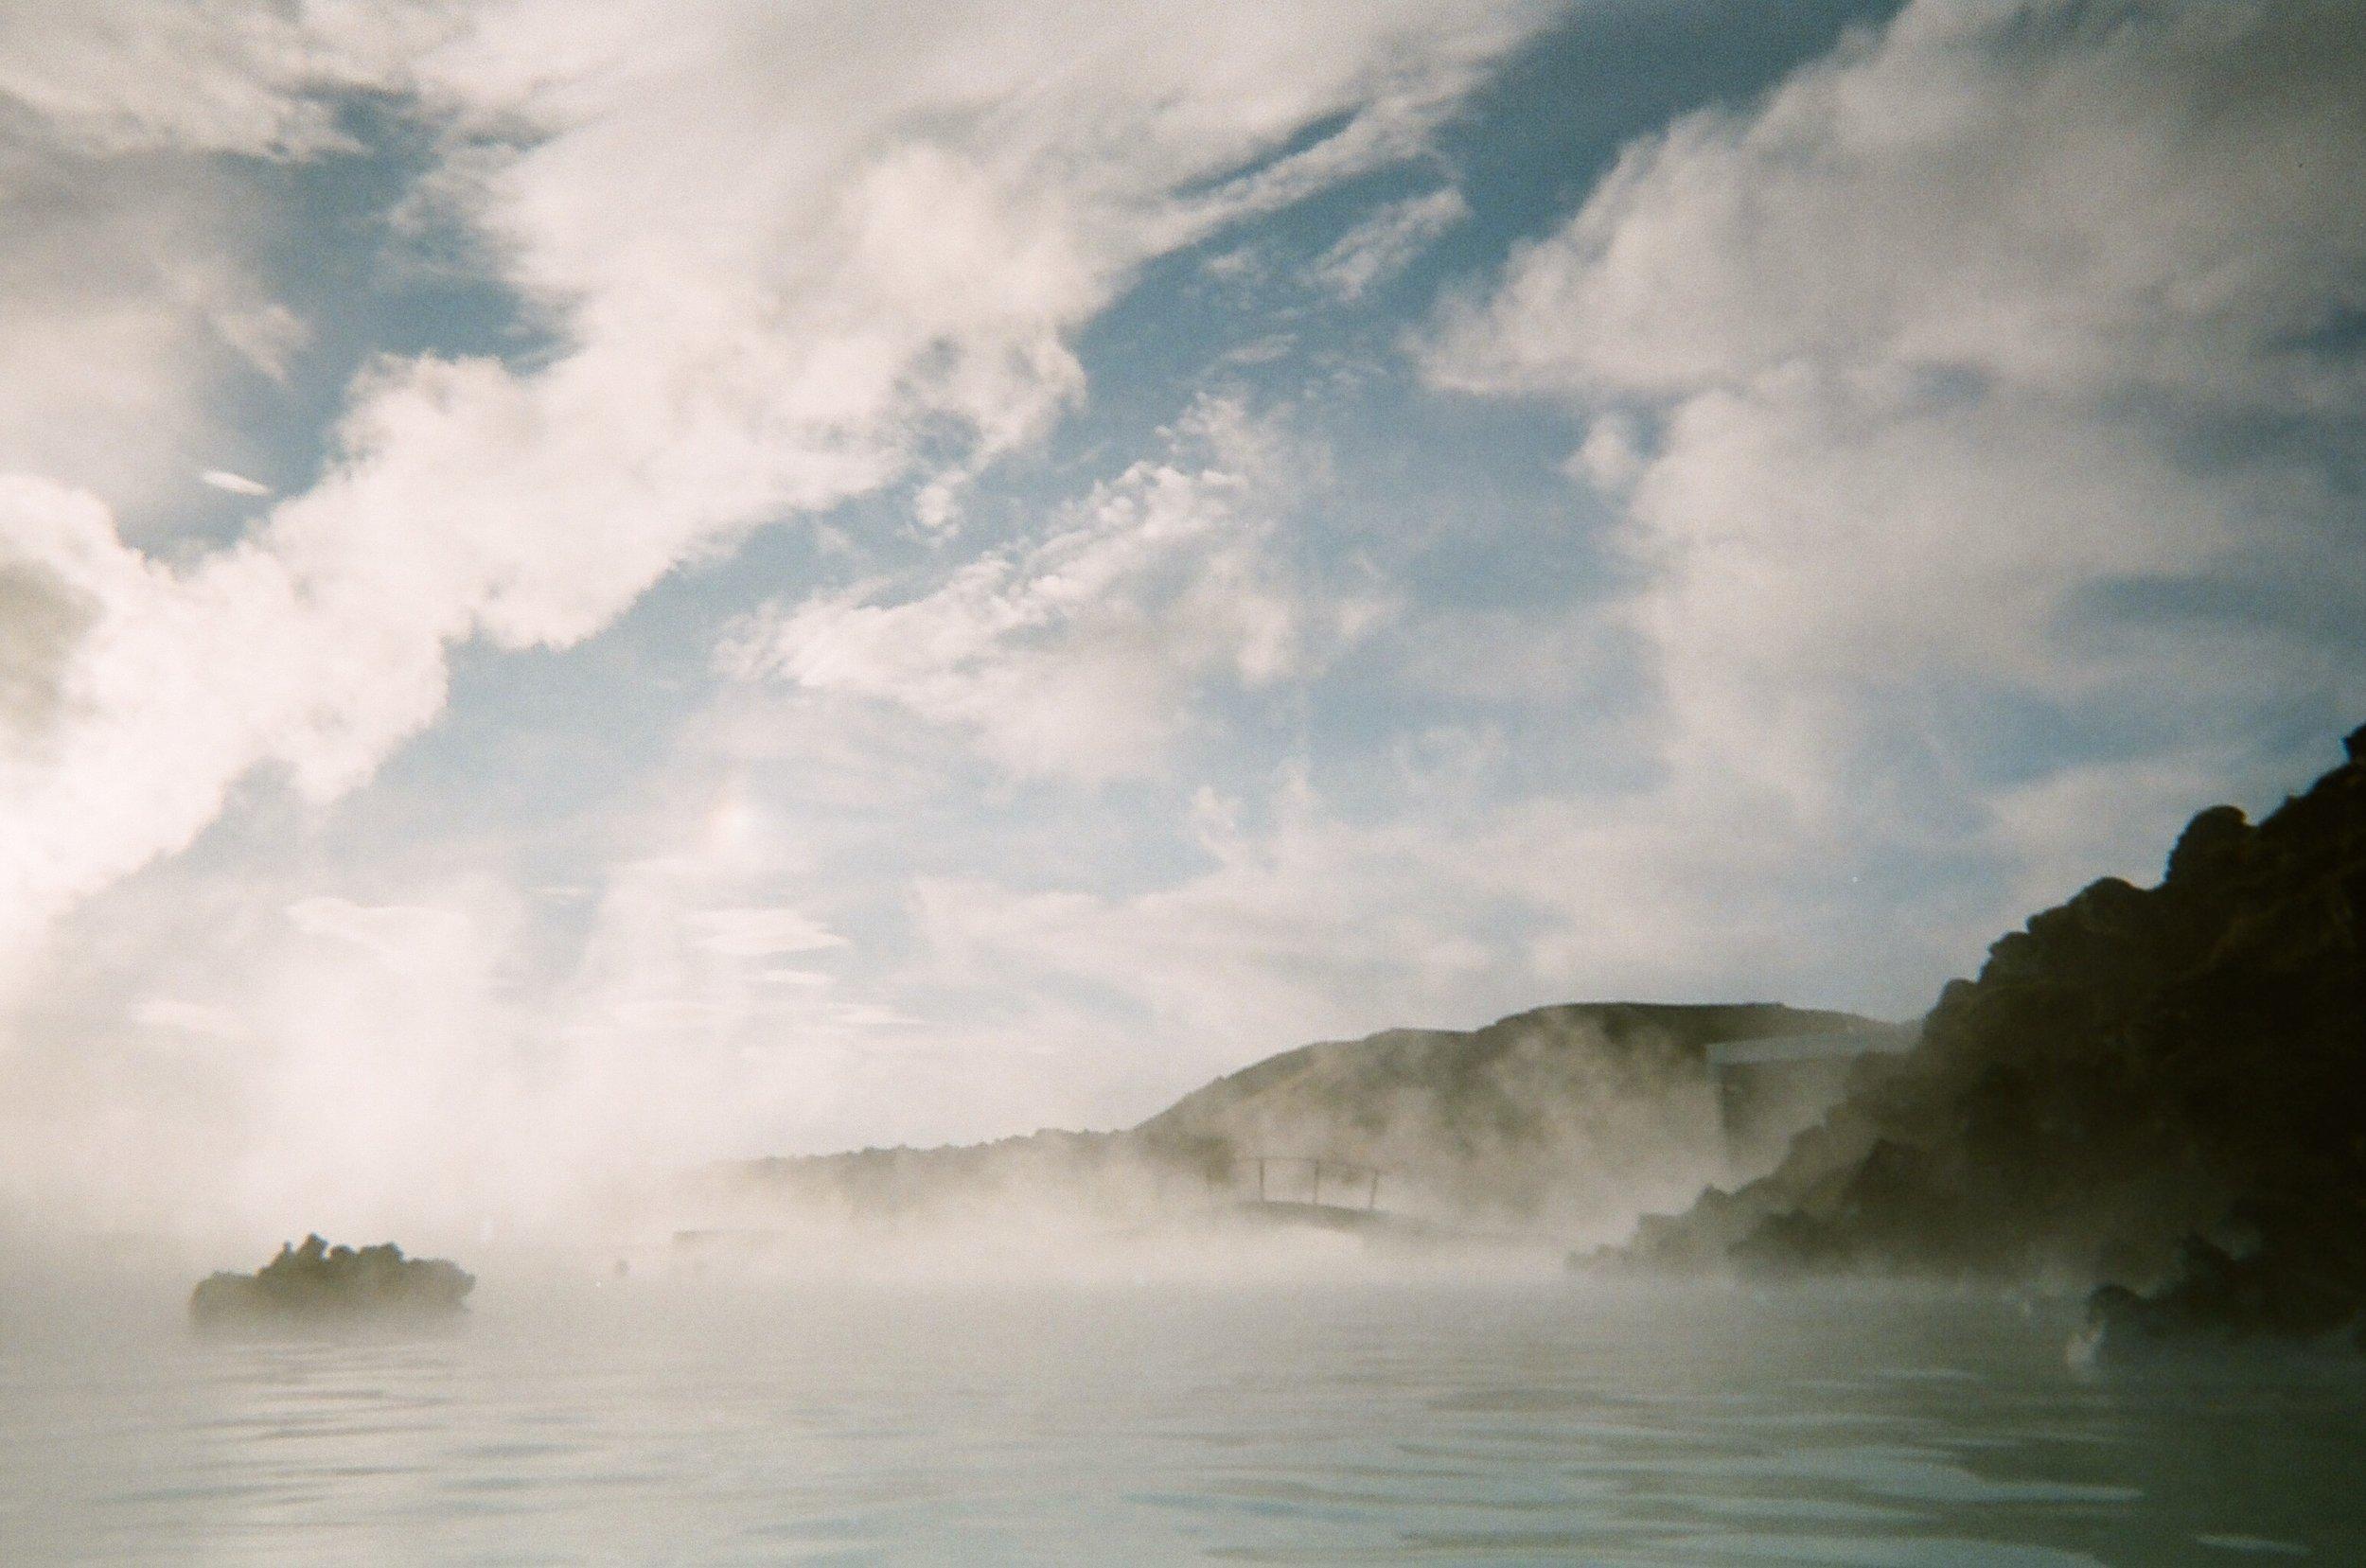 Iceland - Blue Lagoon - Travel Photographer